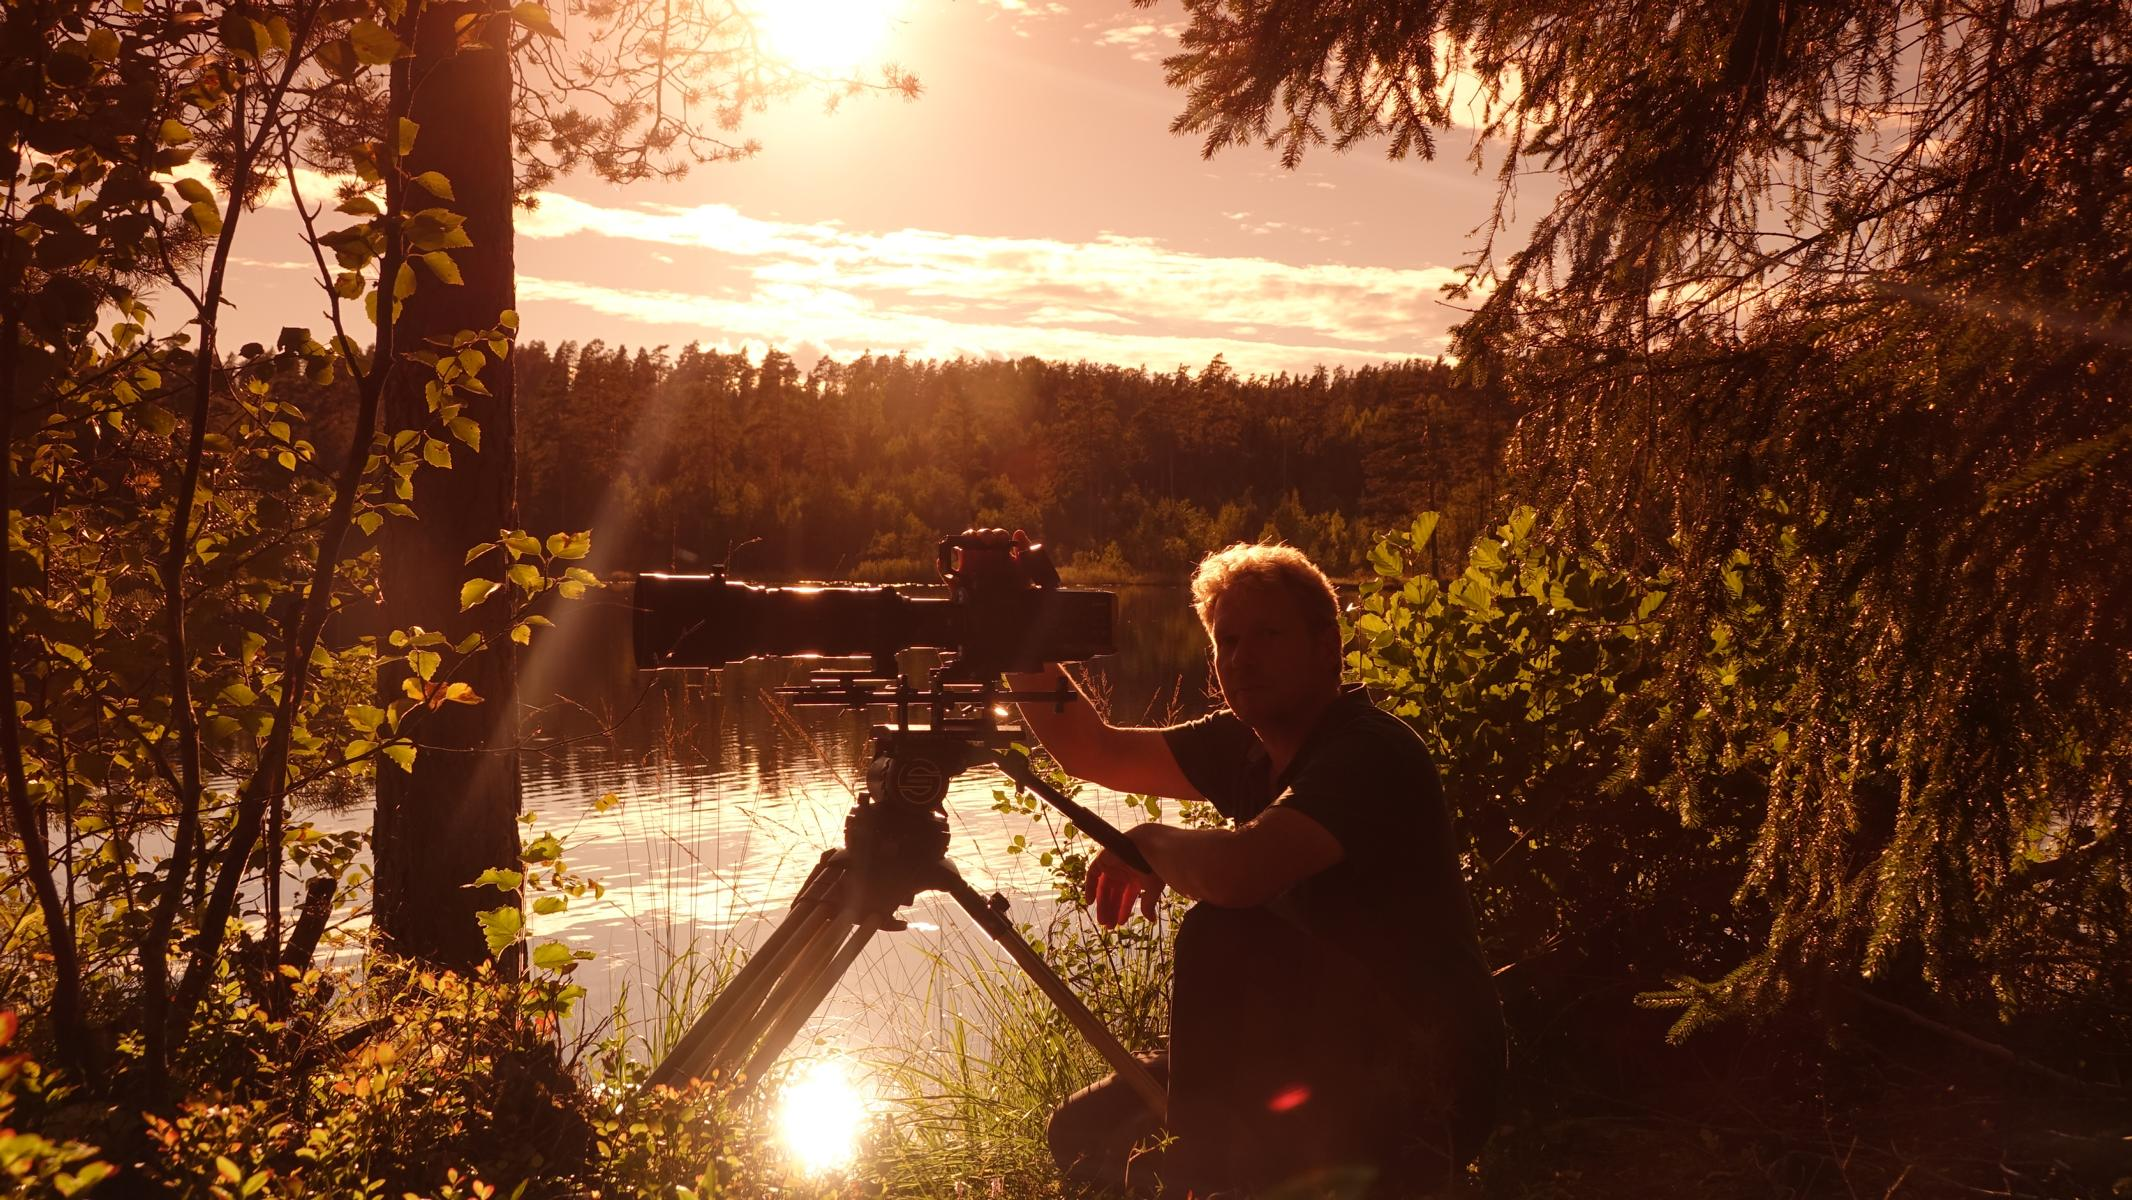 Tierfilmer und Naturfilmer Jens Klingebiel bei Dreharbeiten in Schweden